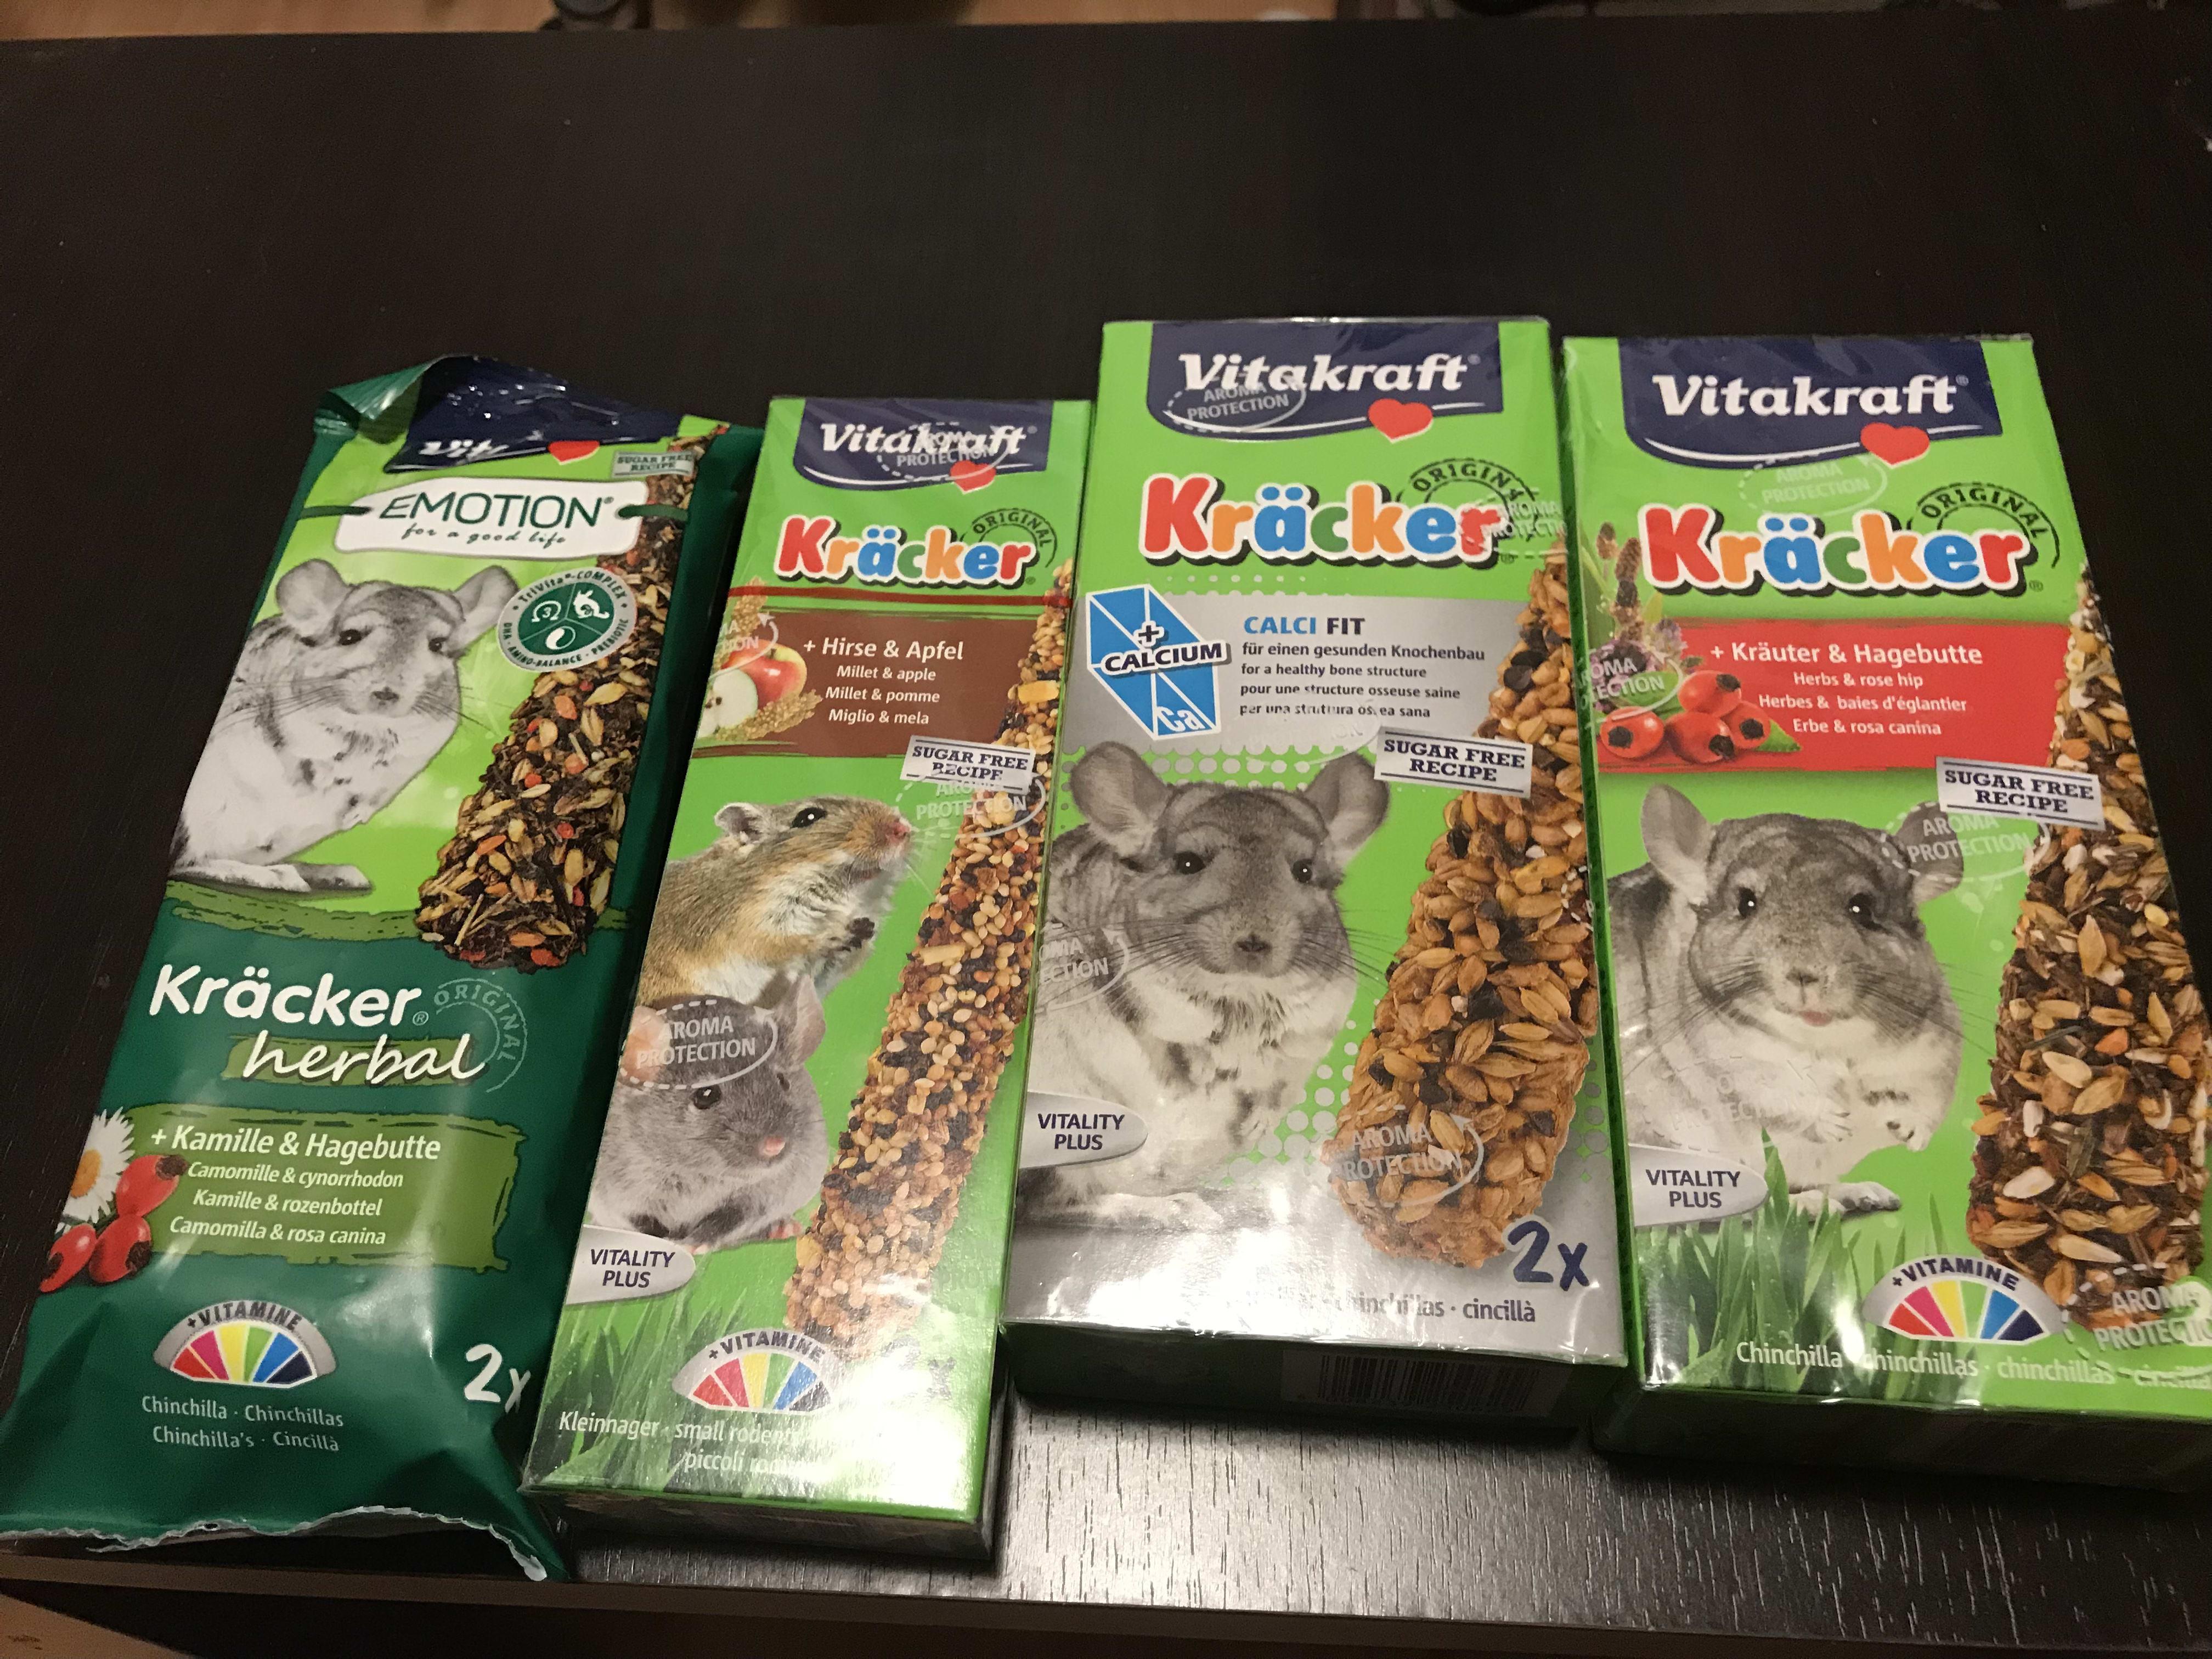 Picture 2 for Vitakraft Kracker Chinchilla Small Animal Food Calcifit